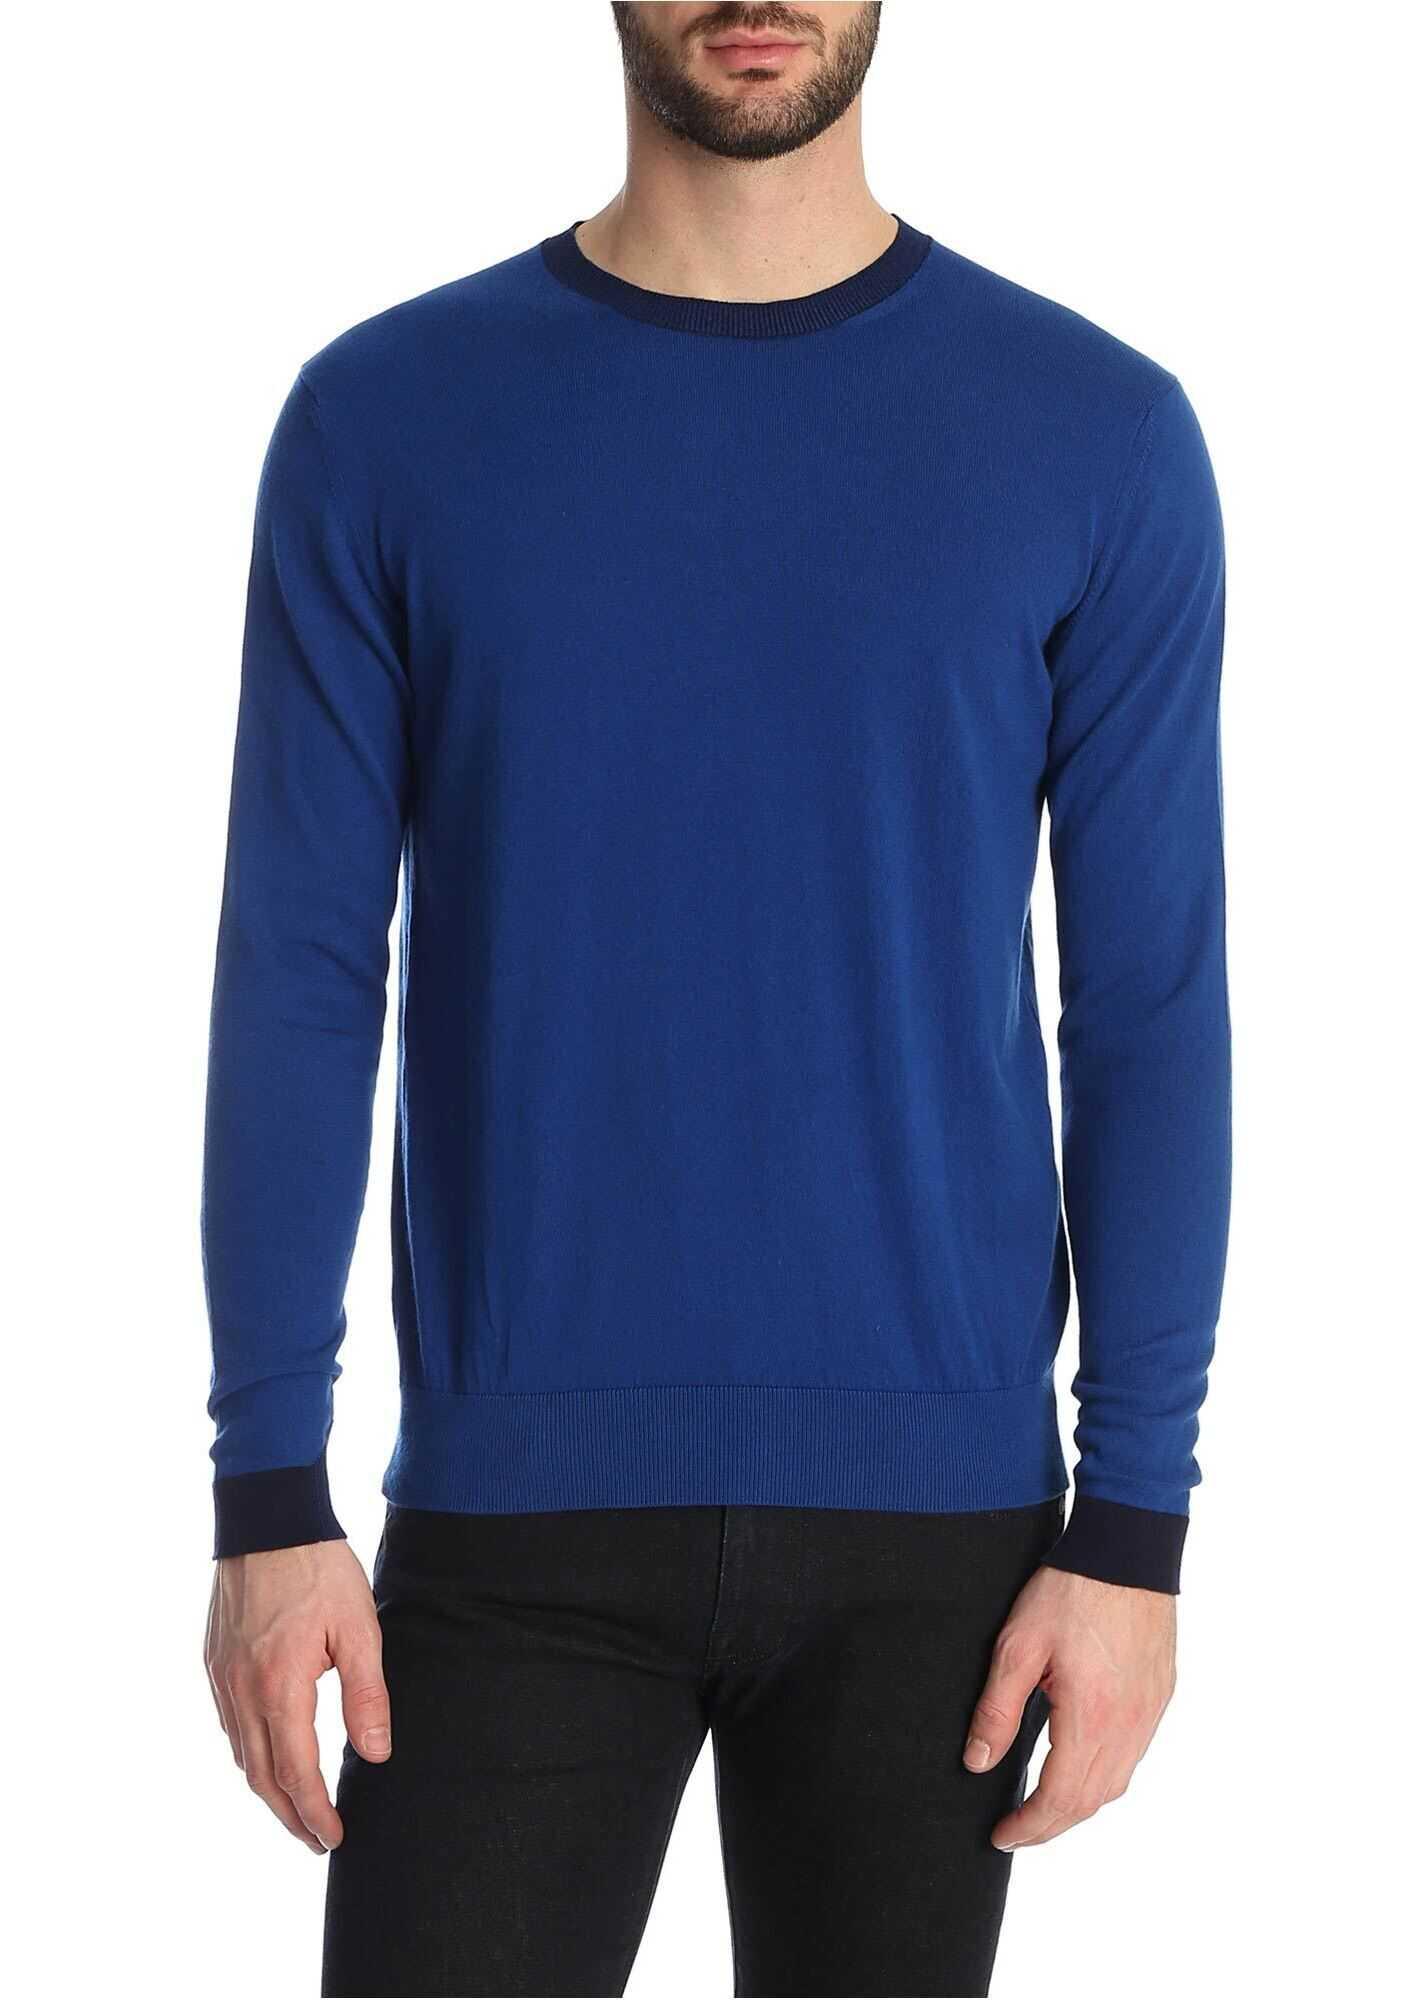 ETRO Crewneck Sweater In Bluette Cotton Blue imagine